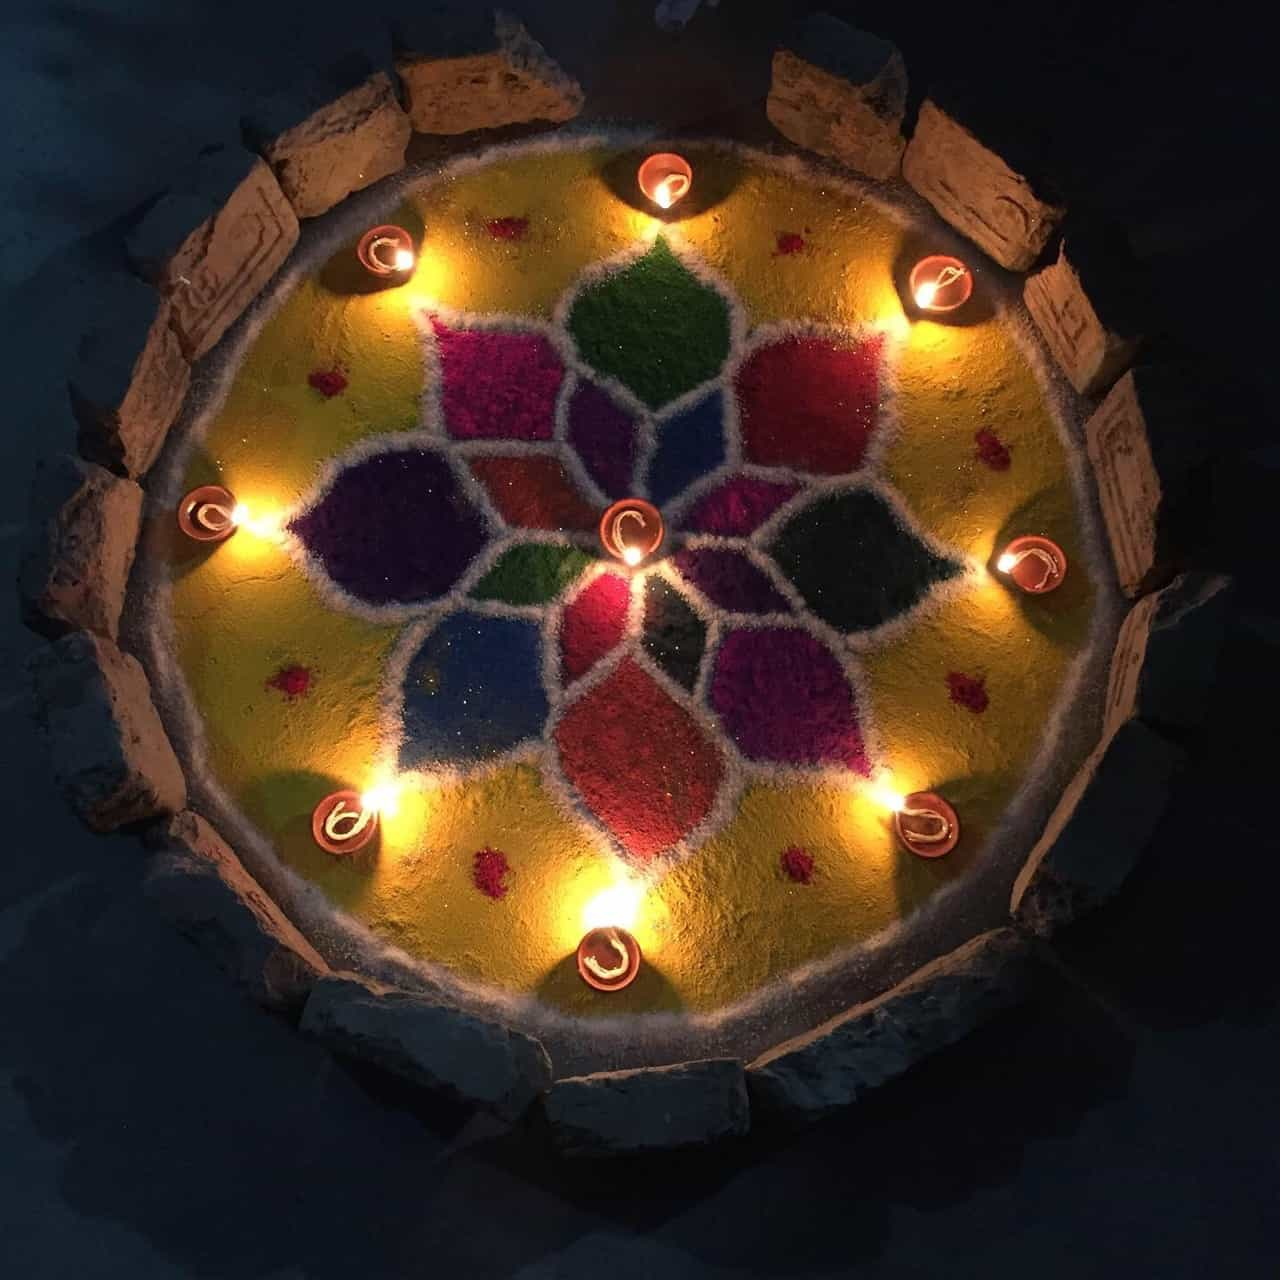 tihar festival nepal, kerzenlicht mandala